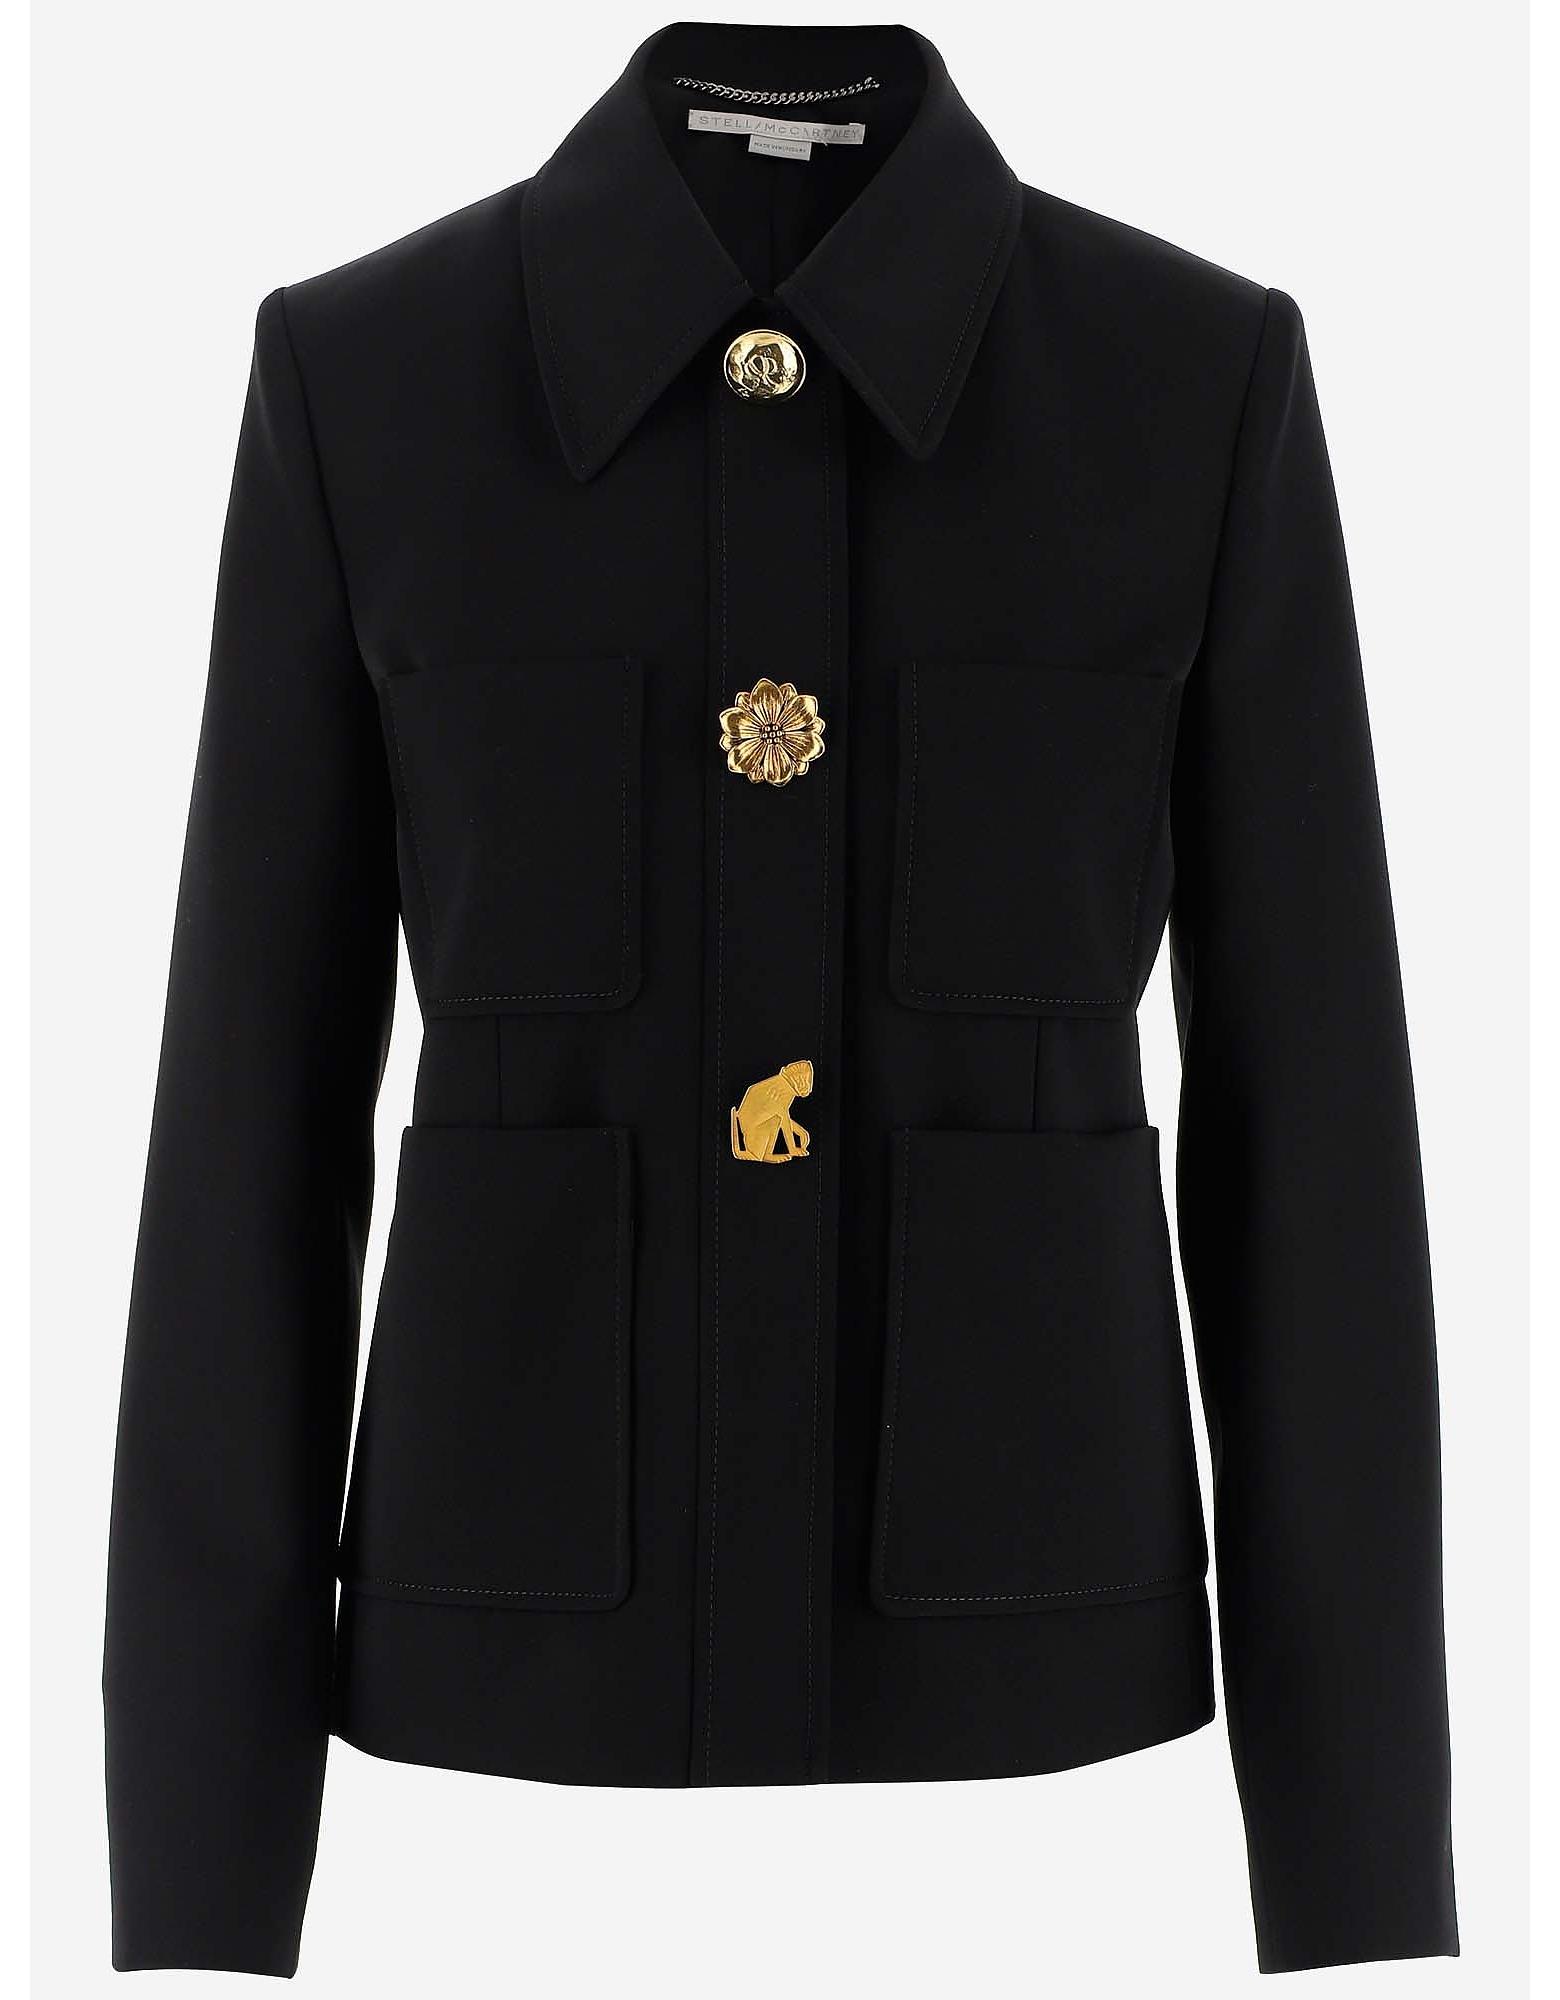 Stella McCartney Designer Coats & Jackets, Women's Blazer